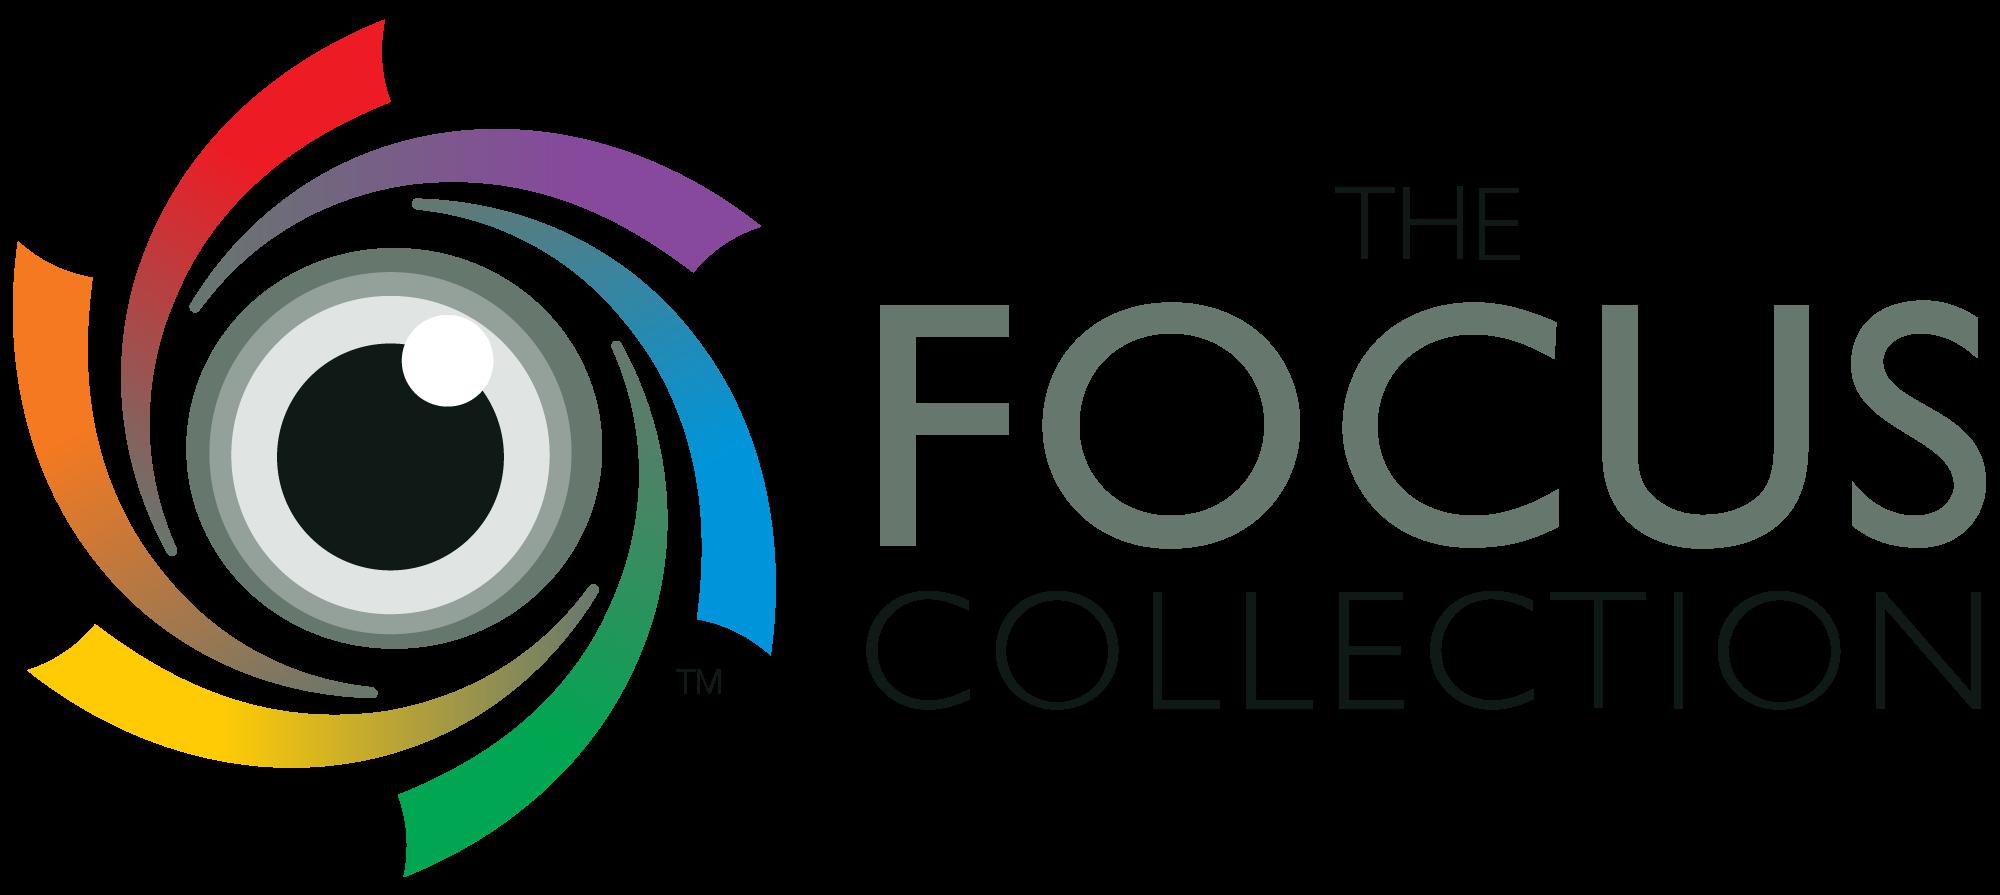 The Focus Collection logo